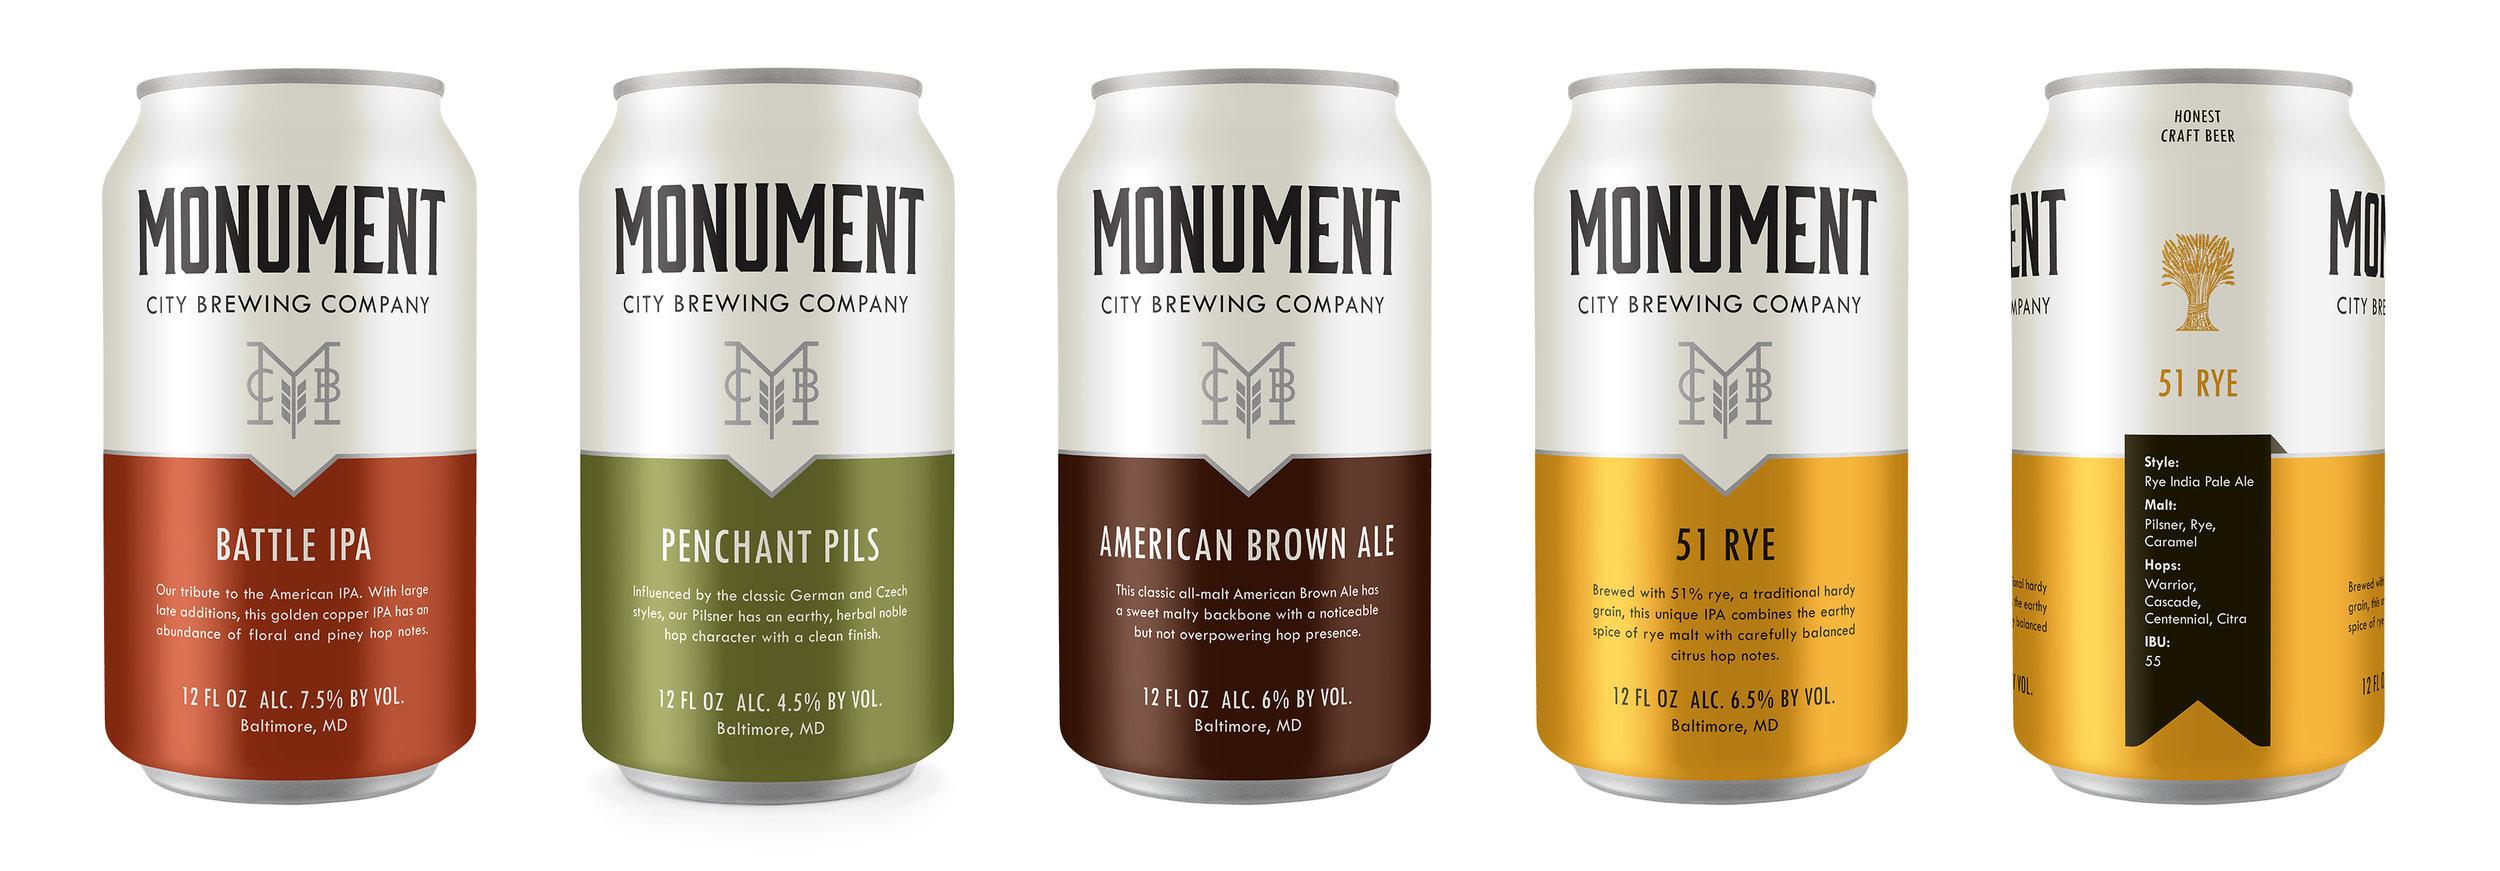 Orange Element - Monument City Brewing Co. 1.jpg